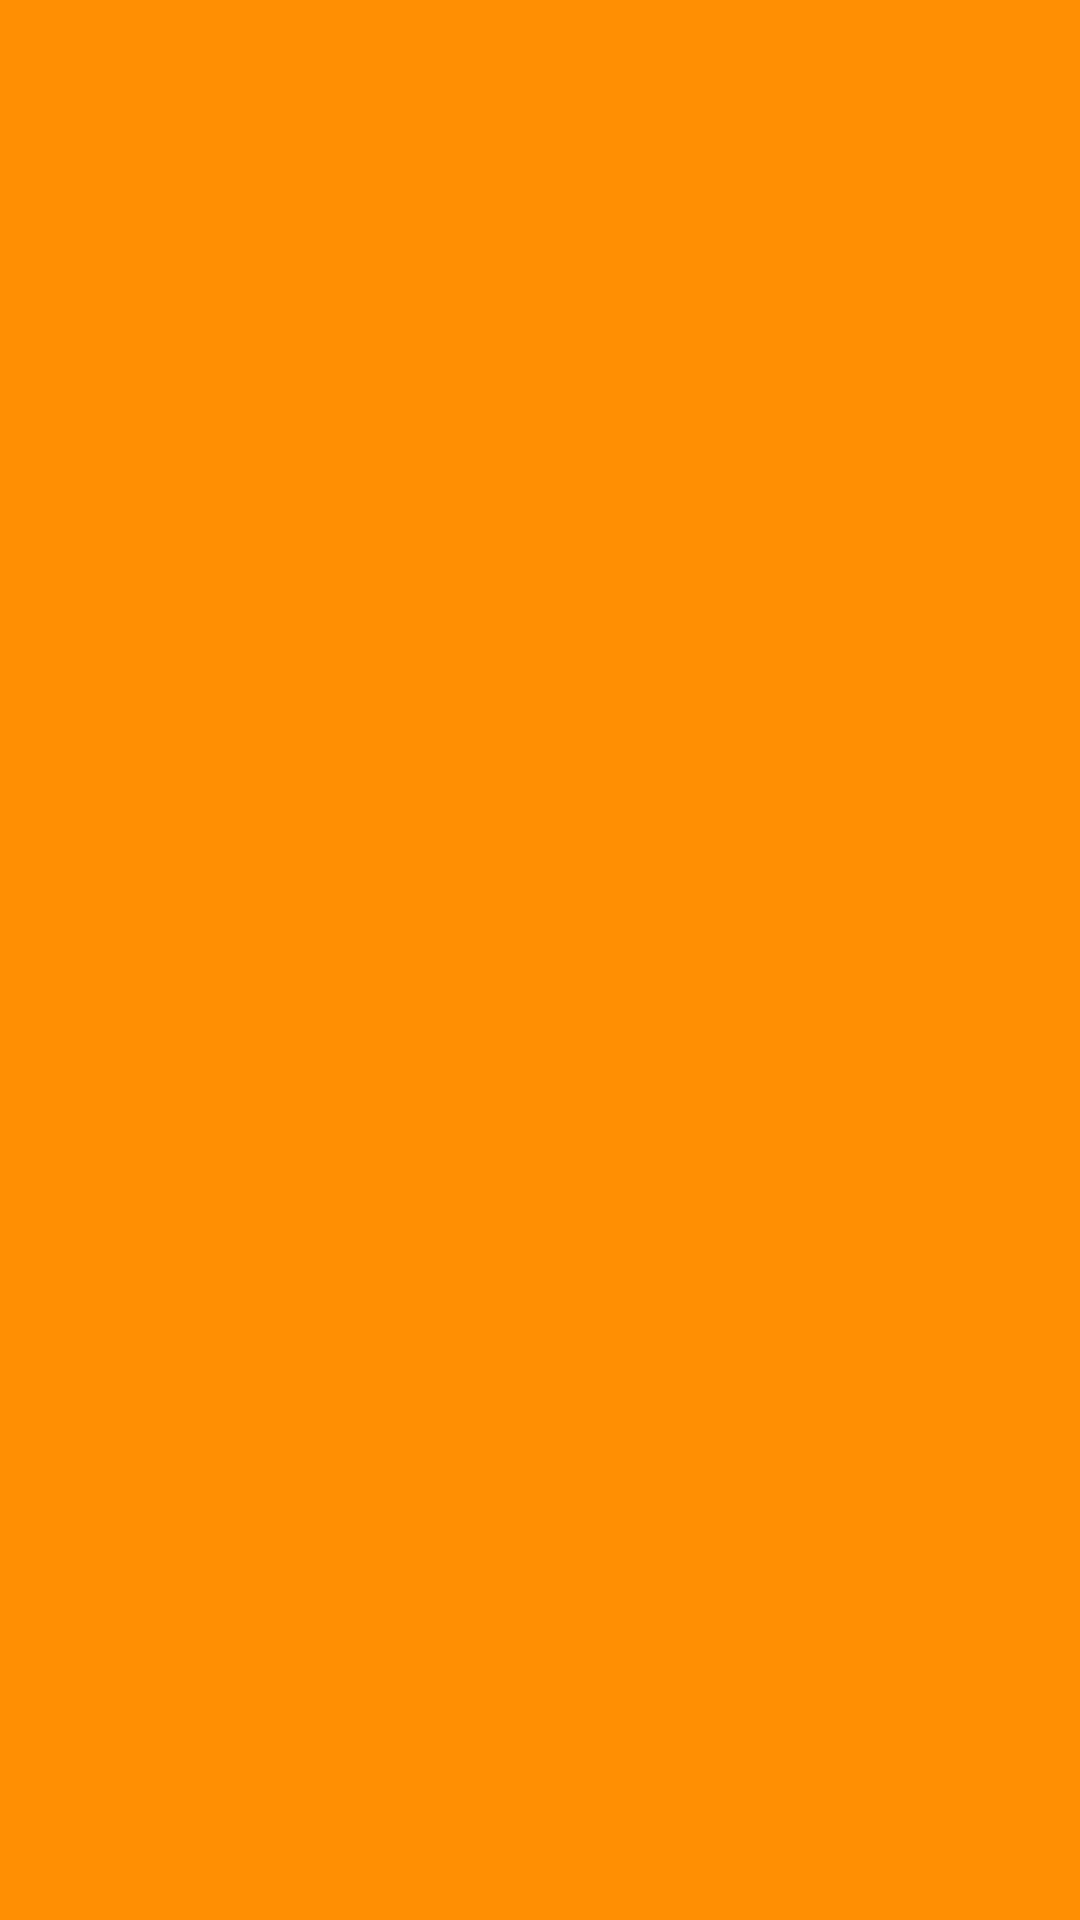 1080x1920 Princeton Orange Solid Color Background